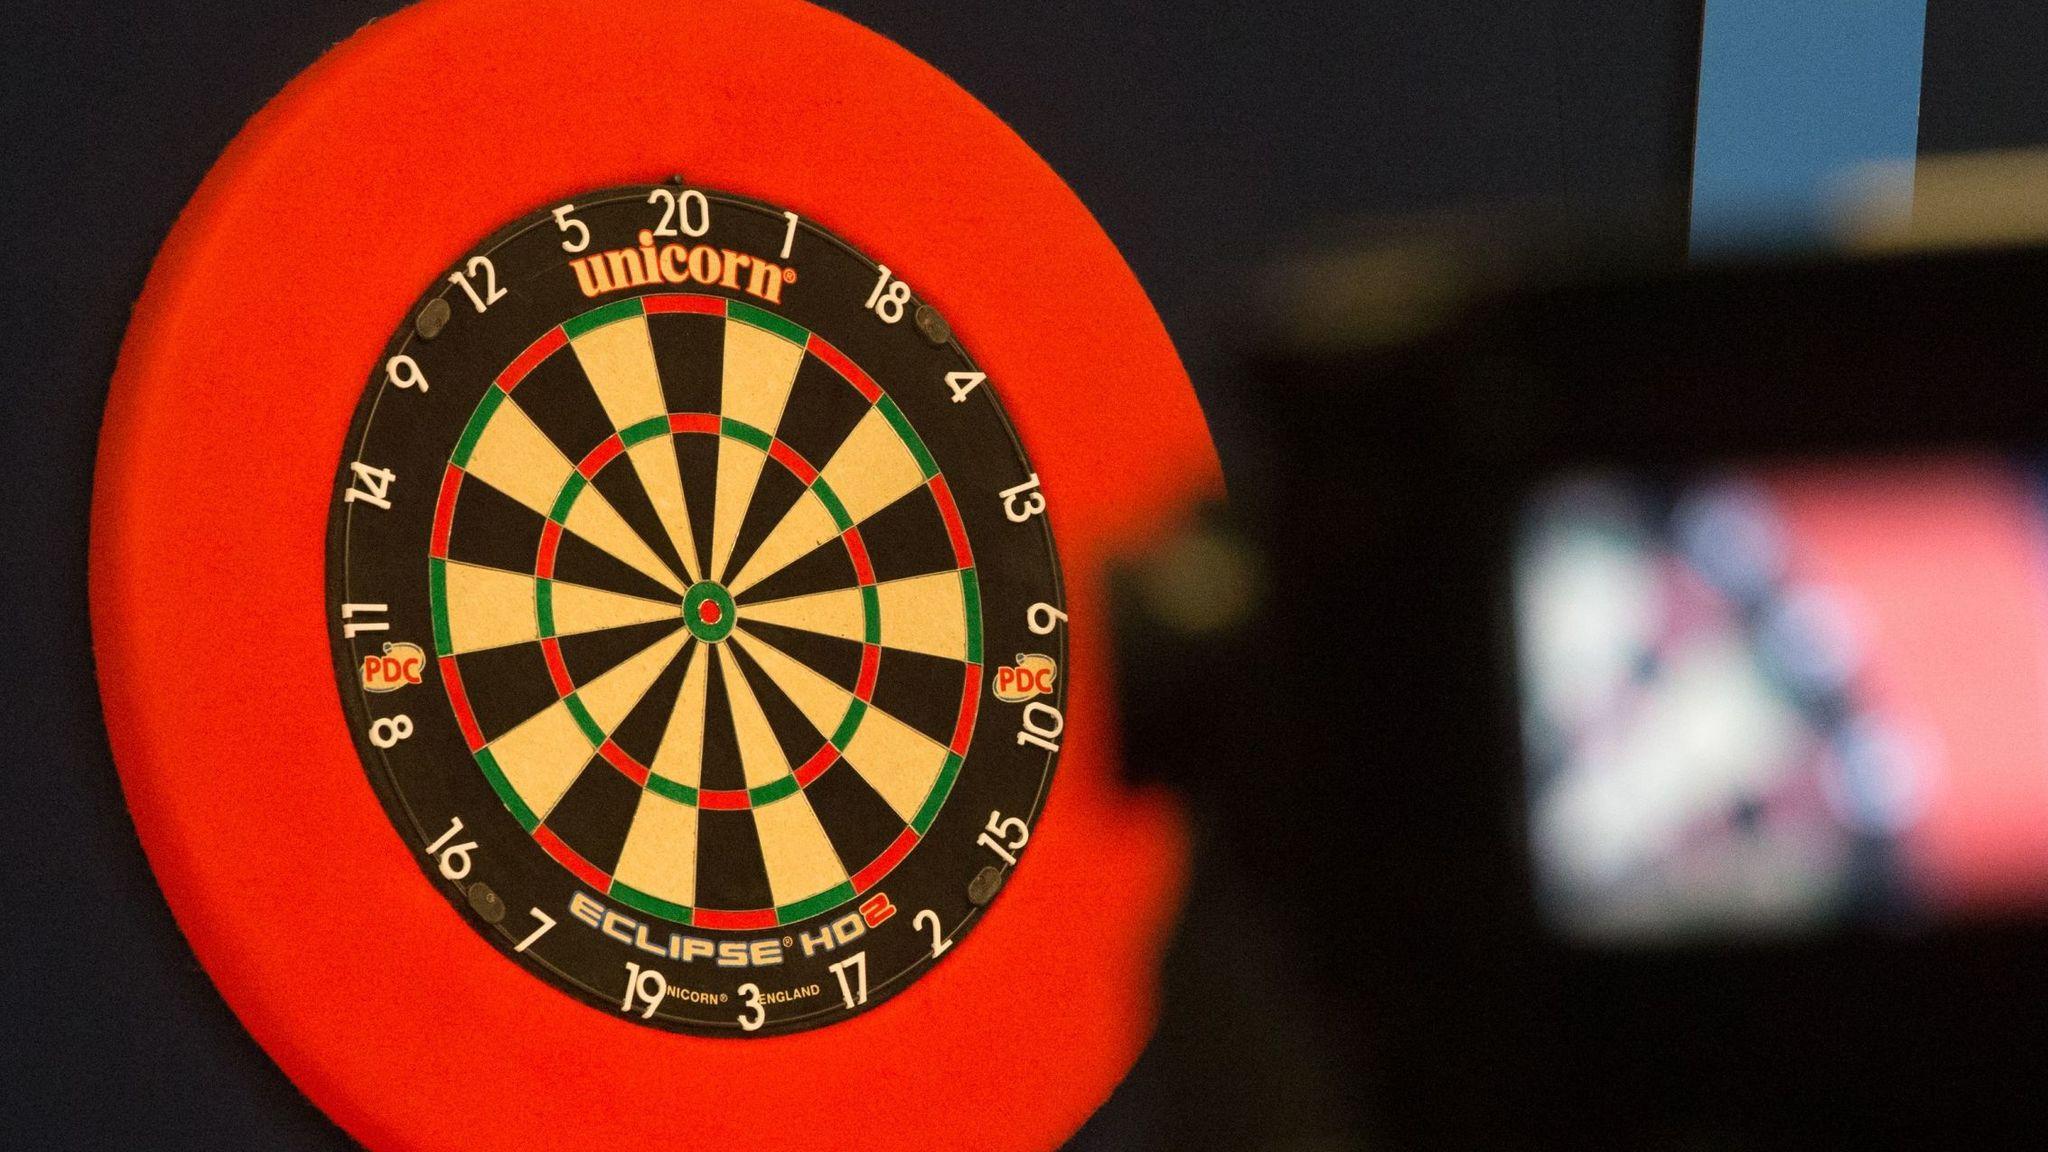 Betting pro darts wallpaper top ten betting sites in nigeria the richest